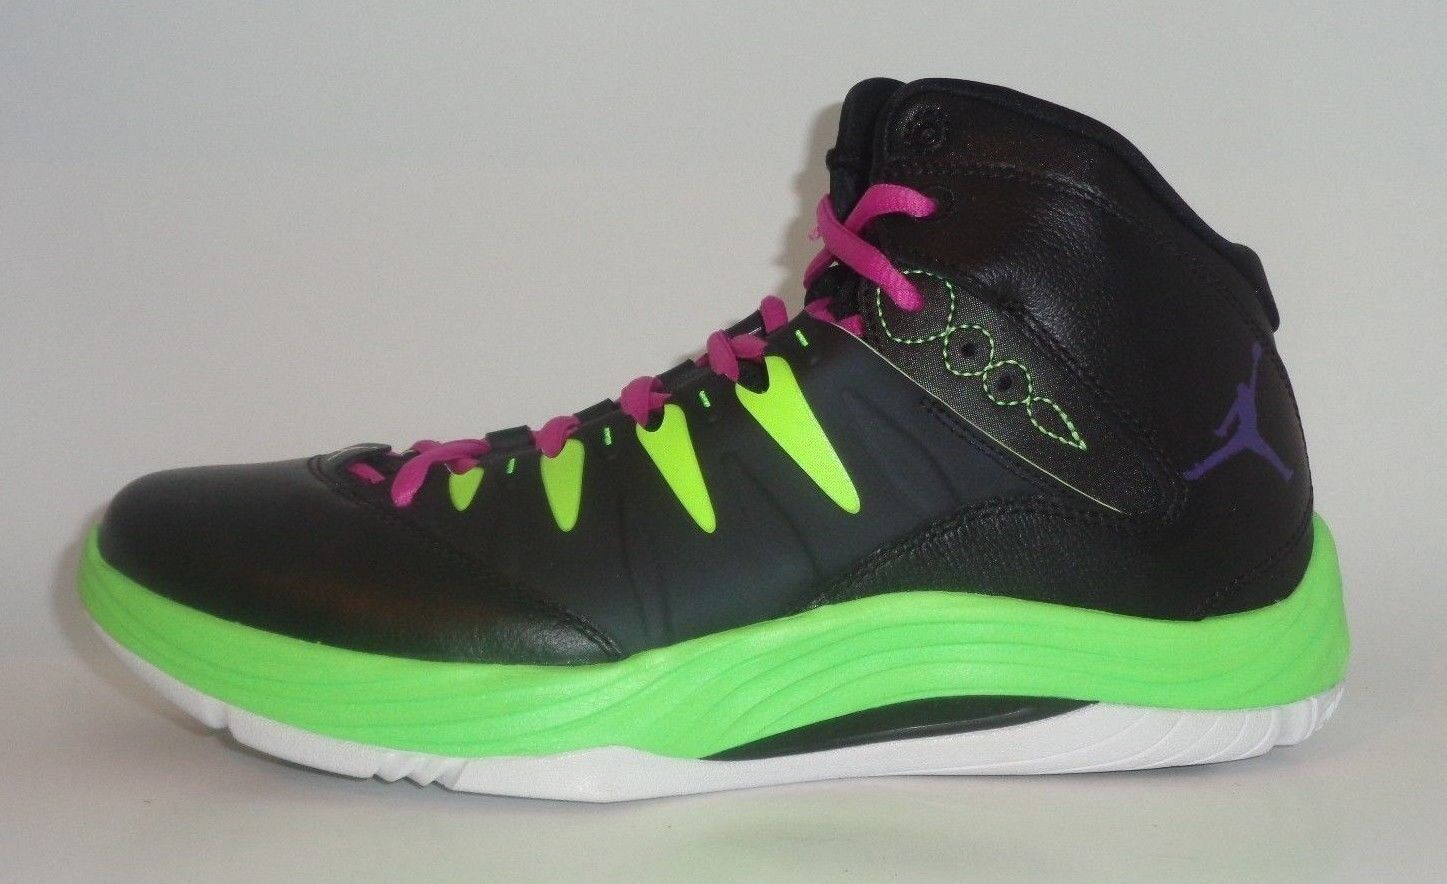 Jordan Prime.fly / Homme Chaussures de Basketball Noir / Prime.fly Cour Purple-Flash 1bf571